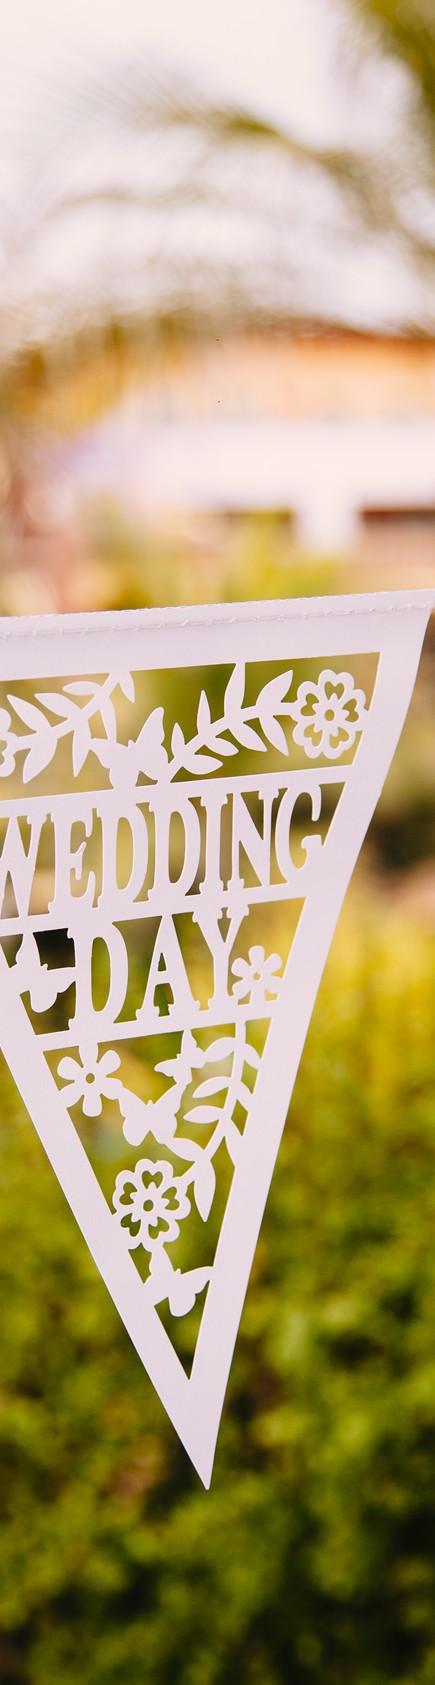 Wedding-Caroline-and-James-in-tenerife-myperfectwedding0469